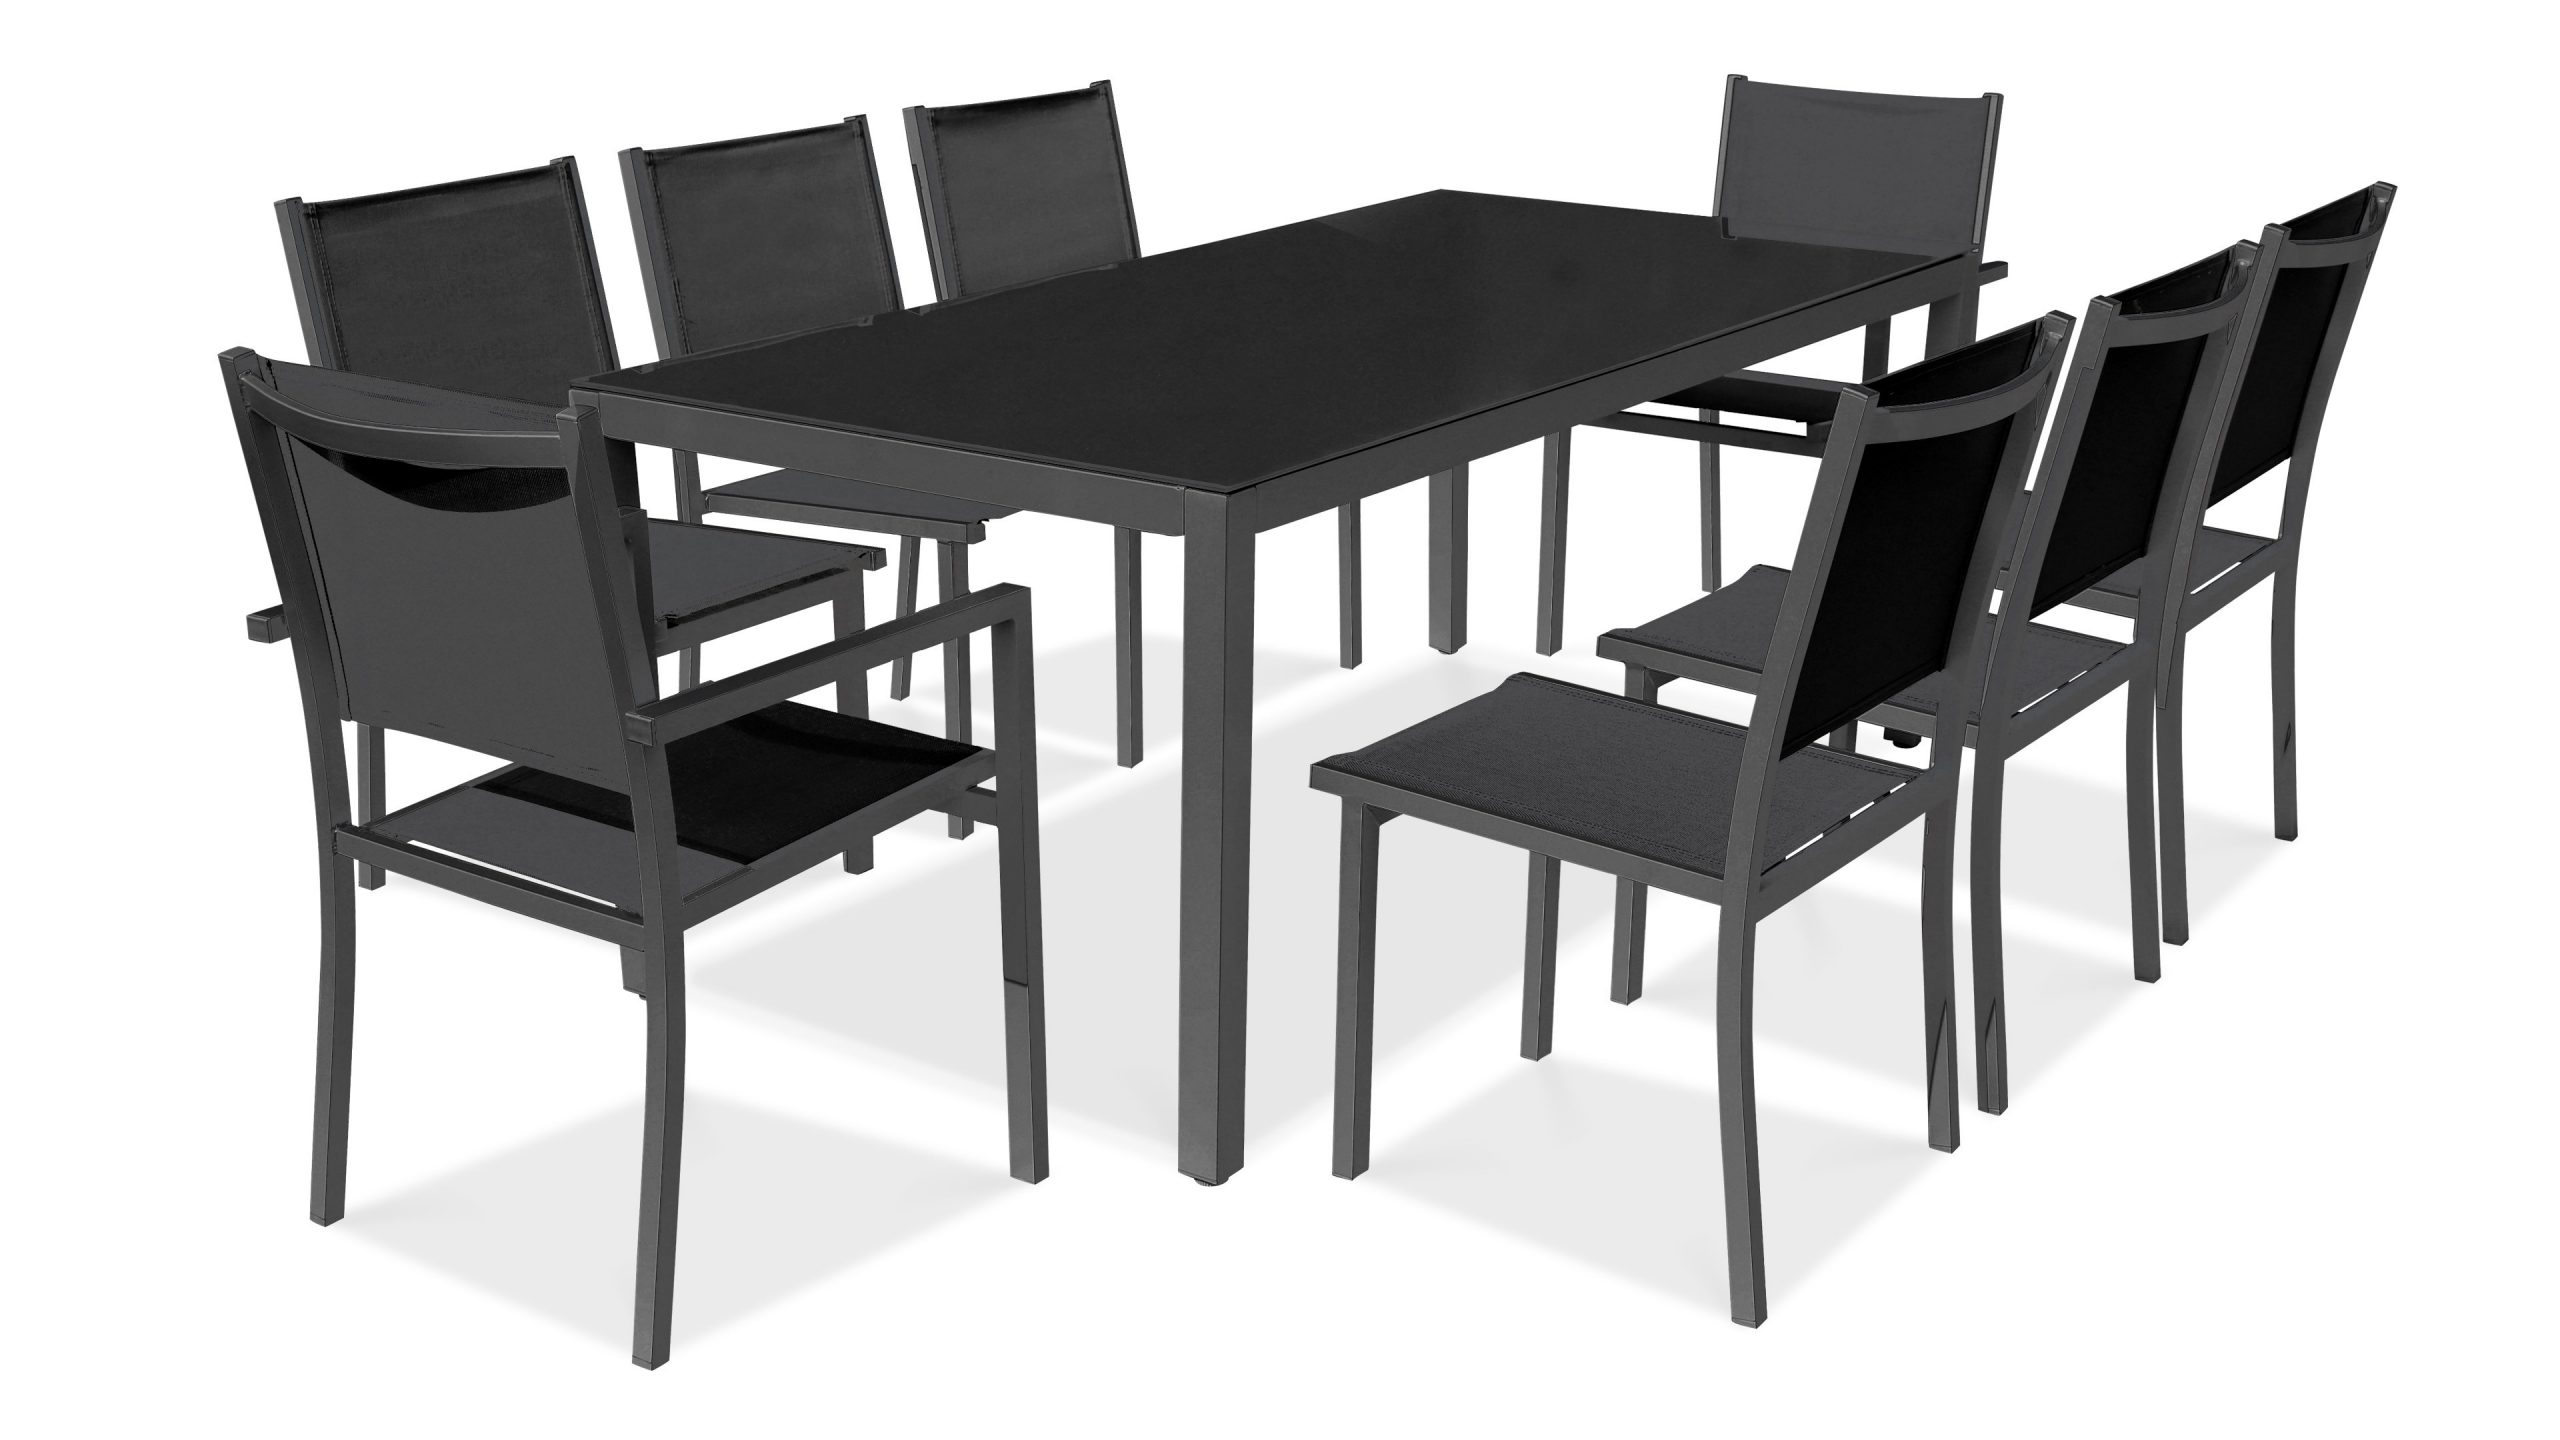 Salon De Jardin Aluminium Table De Jardin 8 Places concernant Ensemble Table De Jardin Promotion